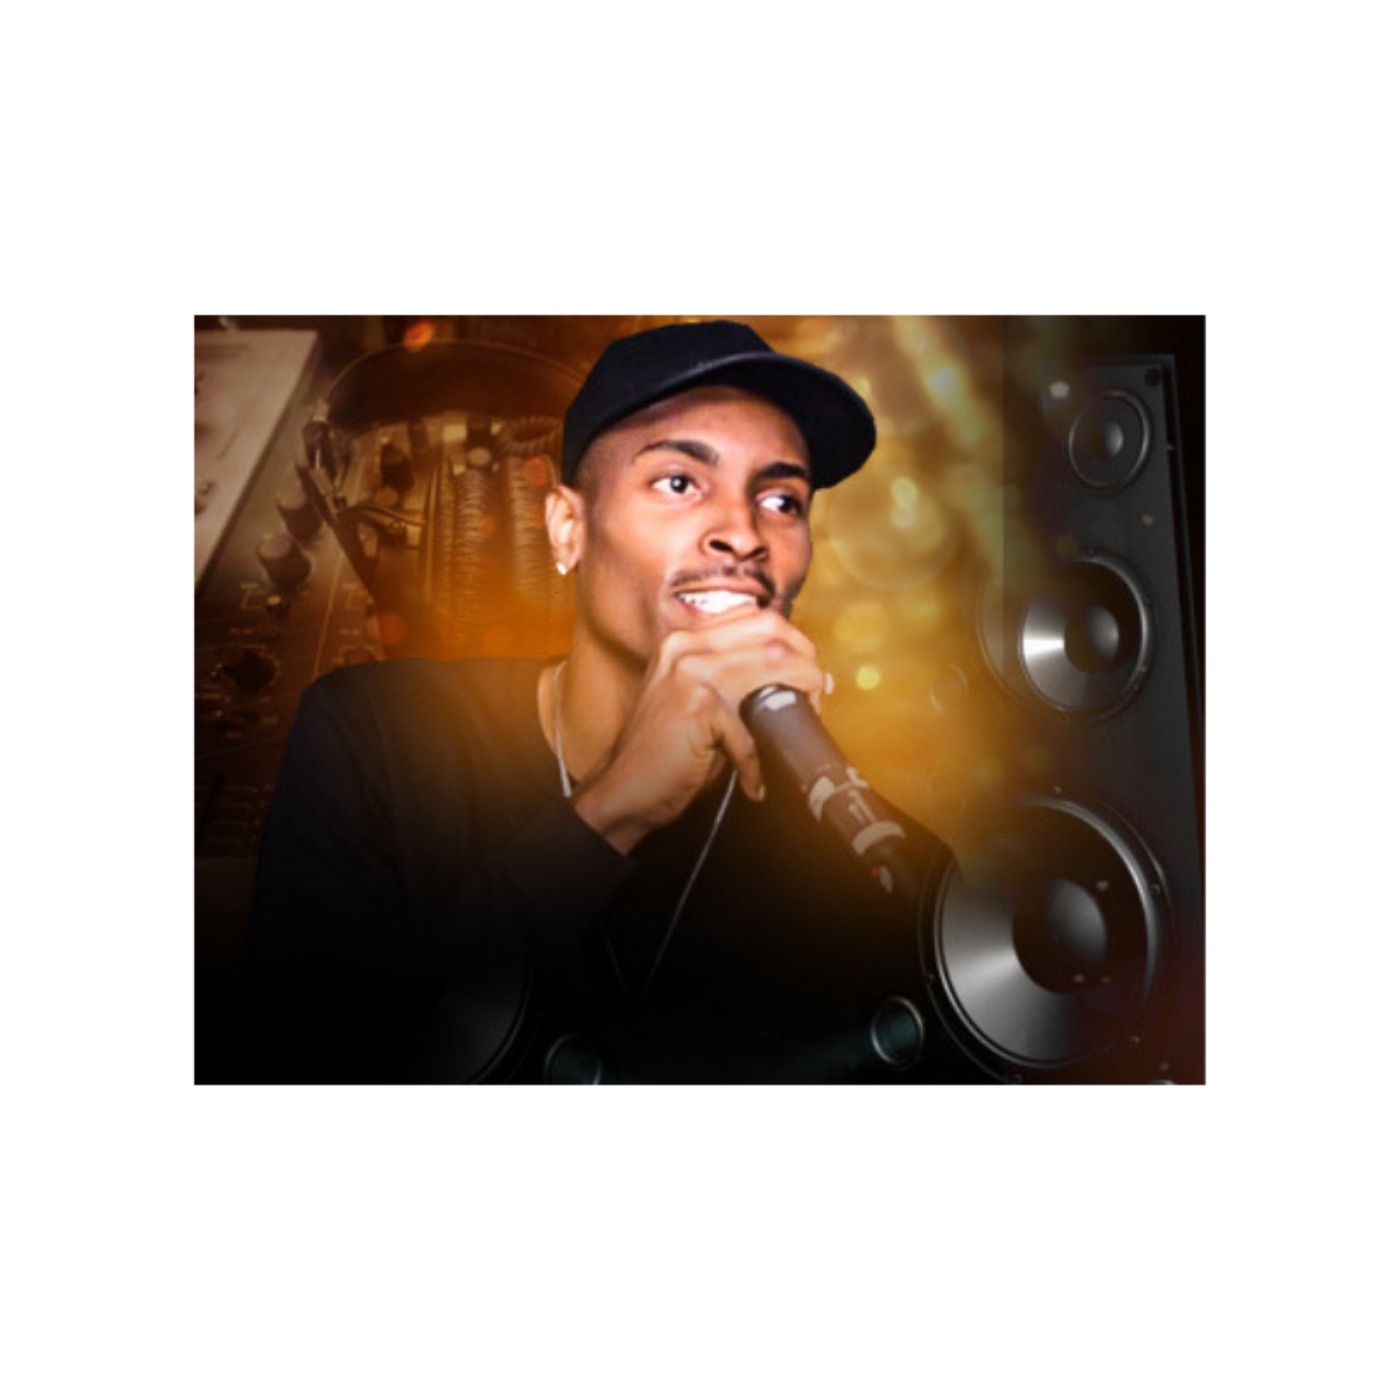 DJ Shawayne's Podcast Podcast - Listen, Reviews, Charts